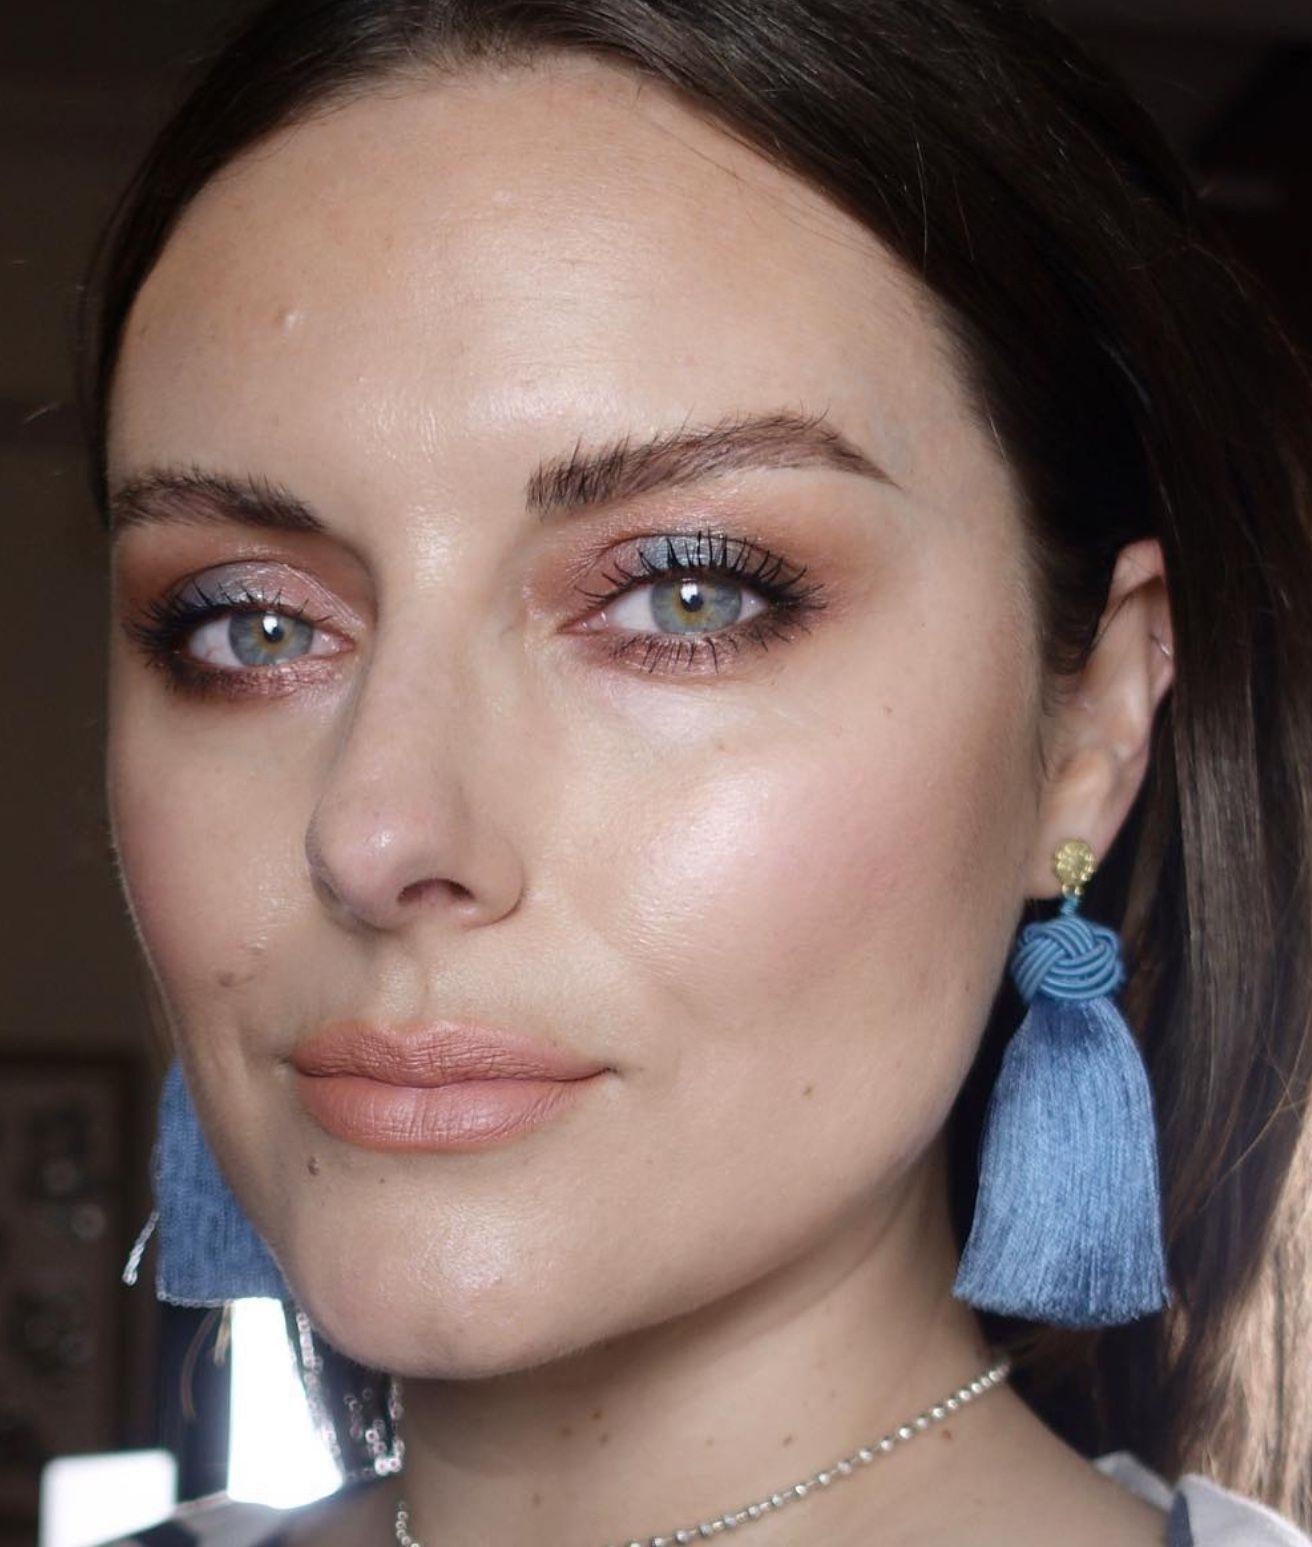 Pin by Chelsea Santos on Makeup Instagram makeup looks